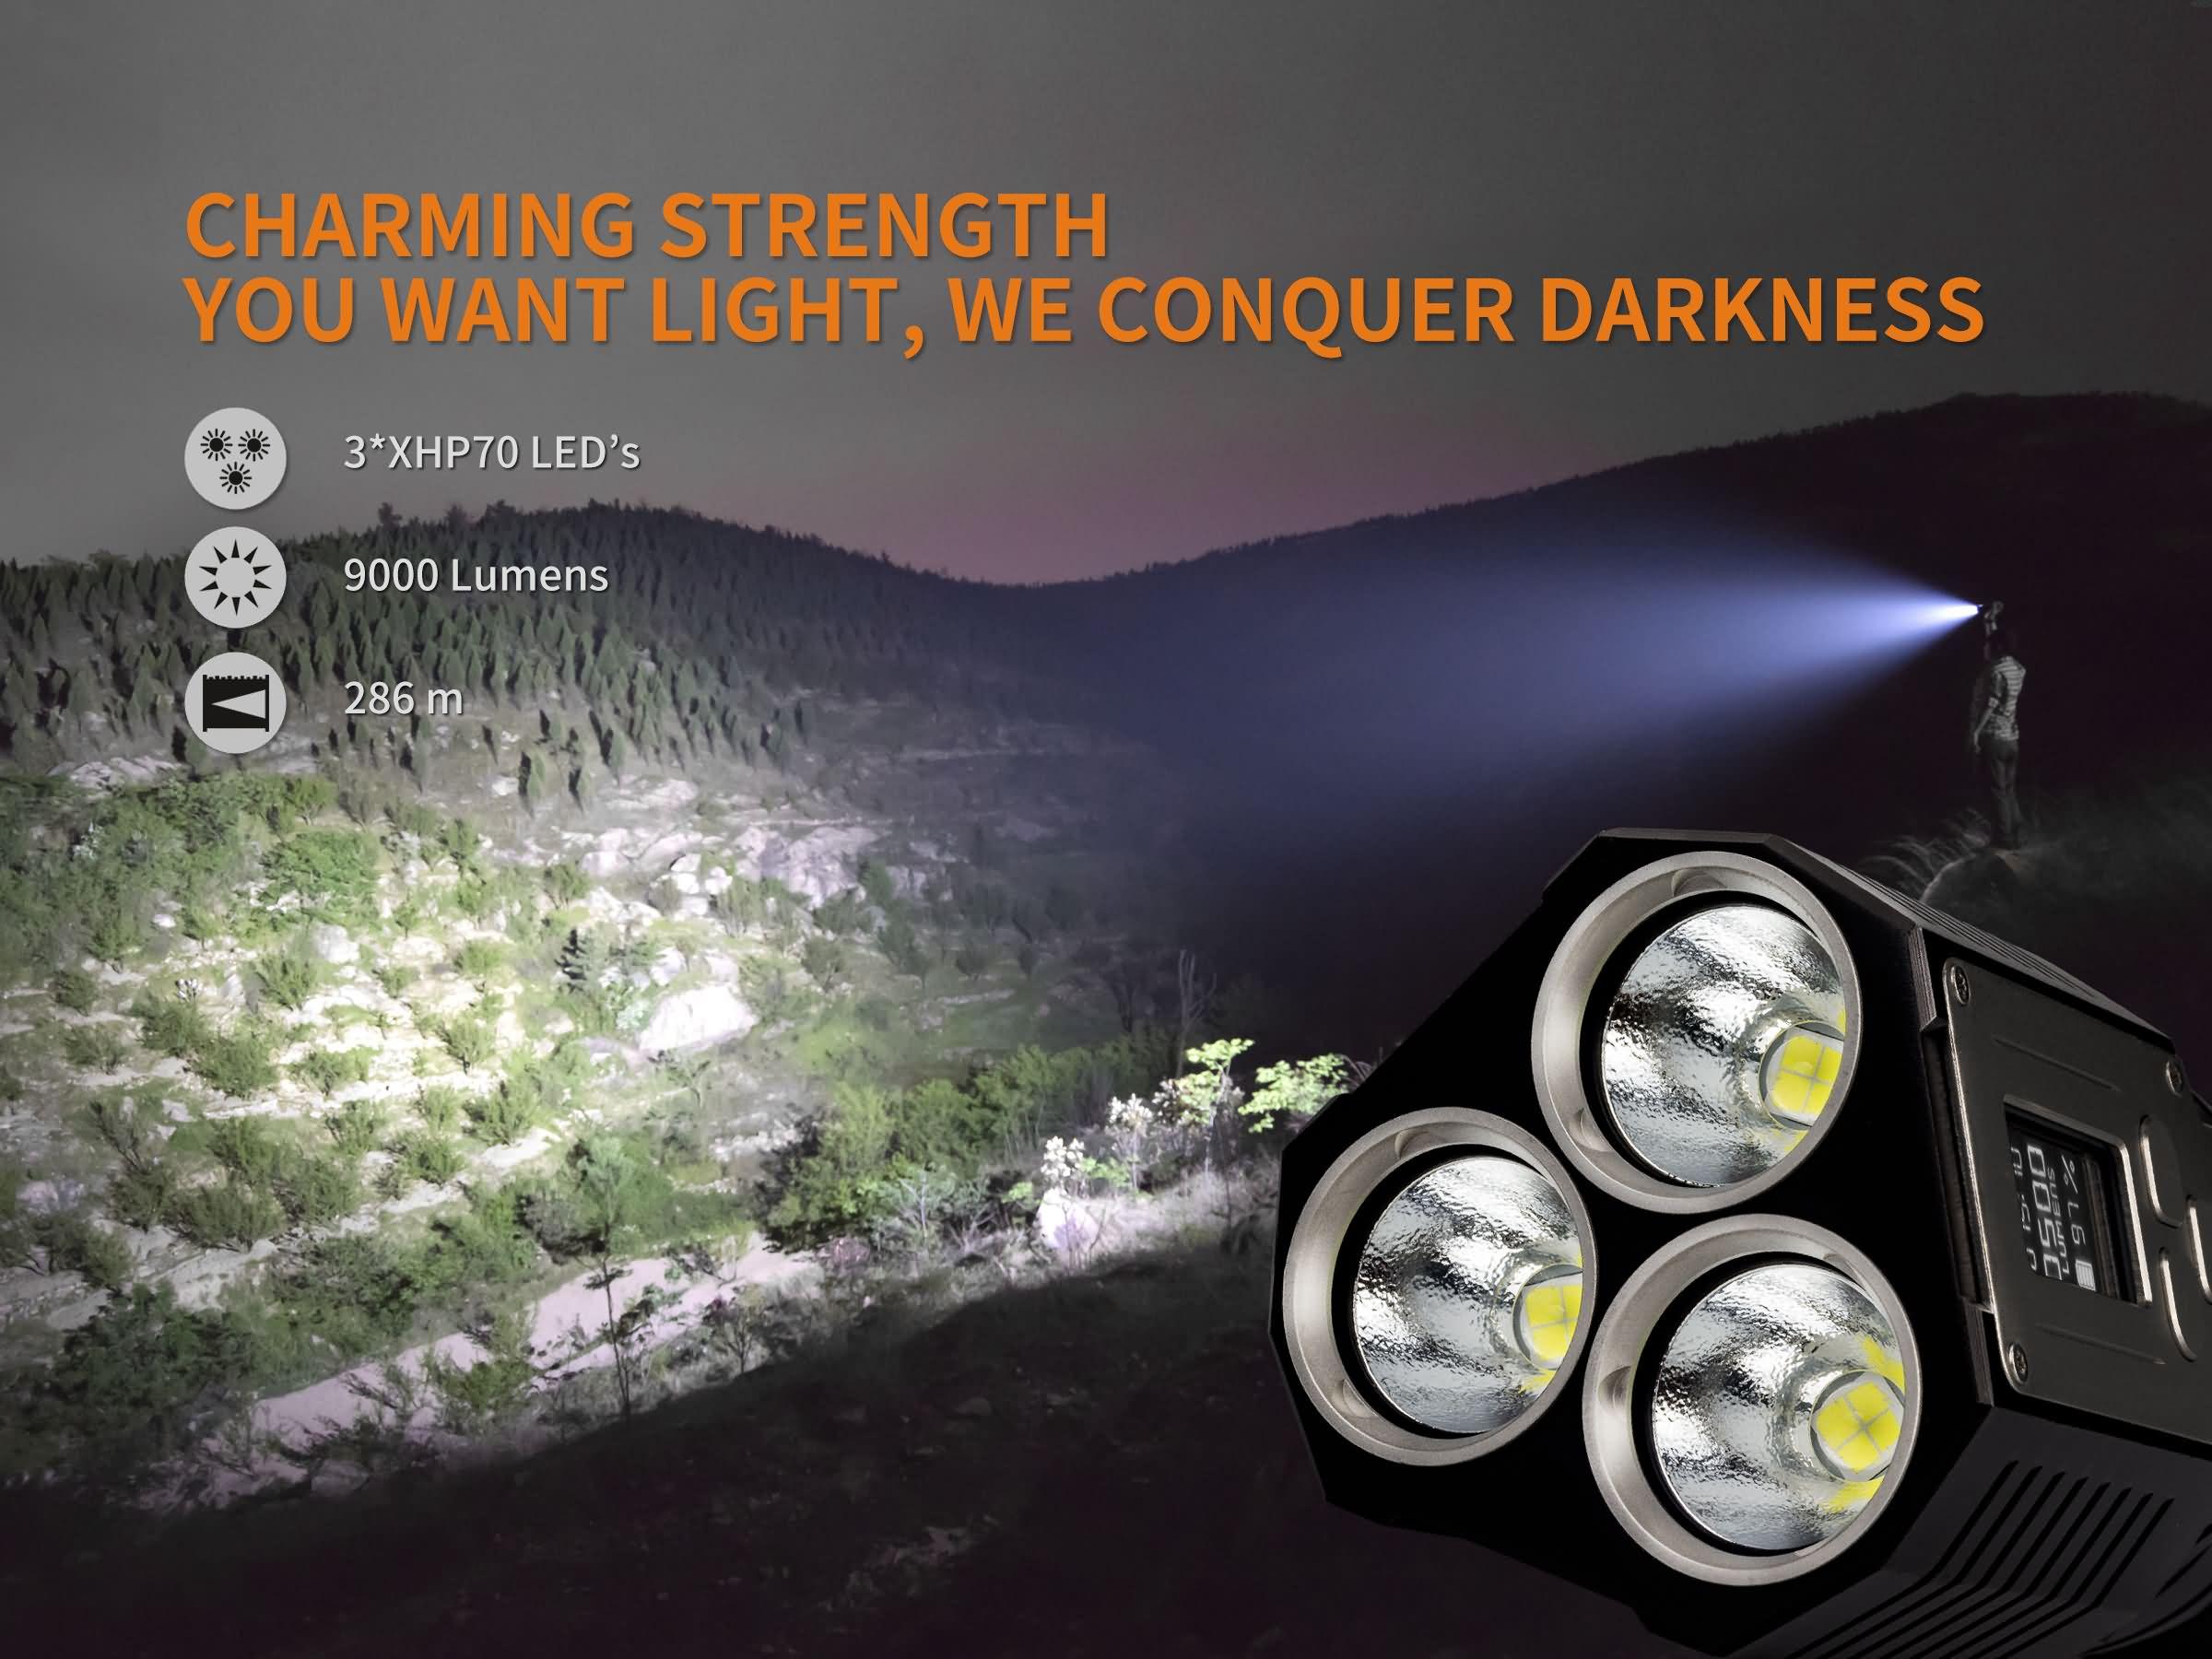 fenix tk72r 3x cree xhp70 led taschenlampe 9000 lumen neu. Black Bedroom Furniture Sets. Home Design Ideas